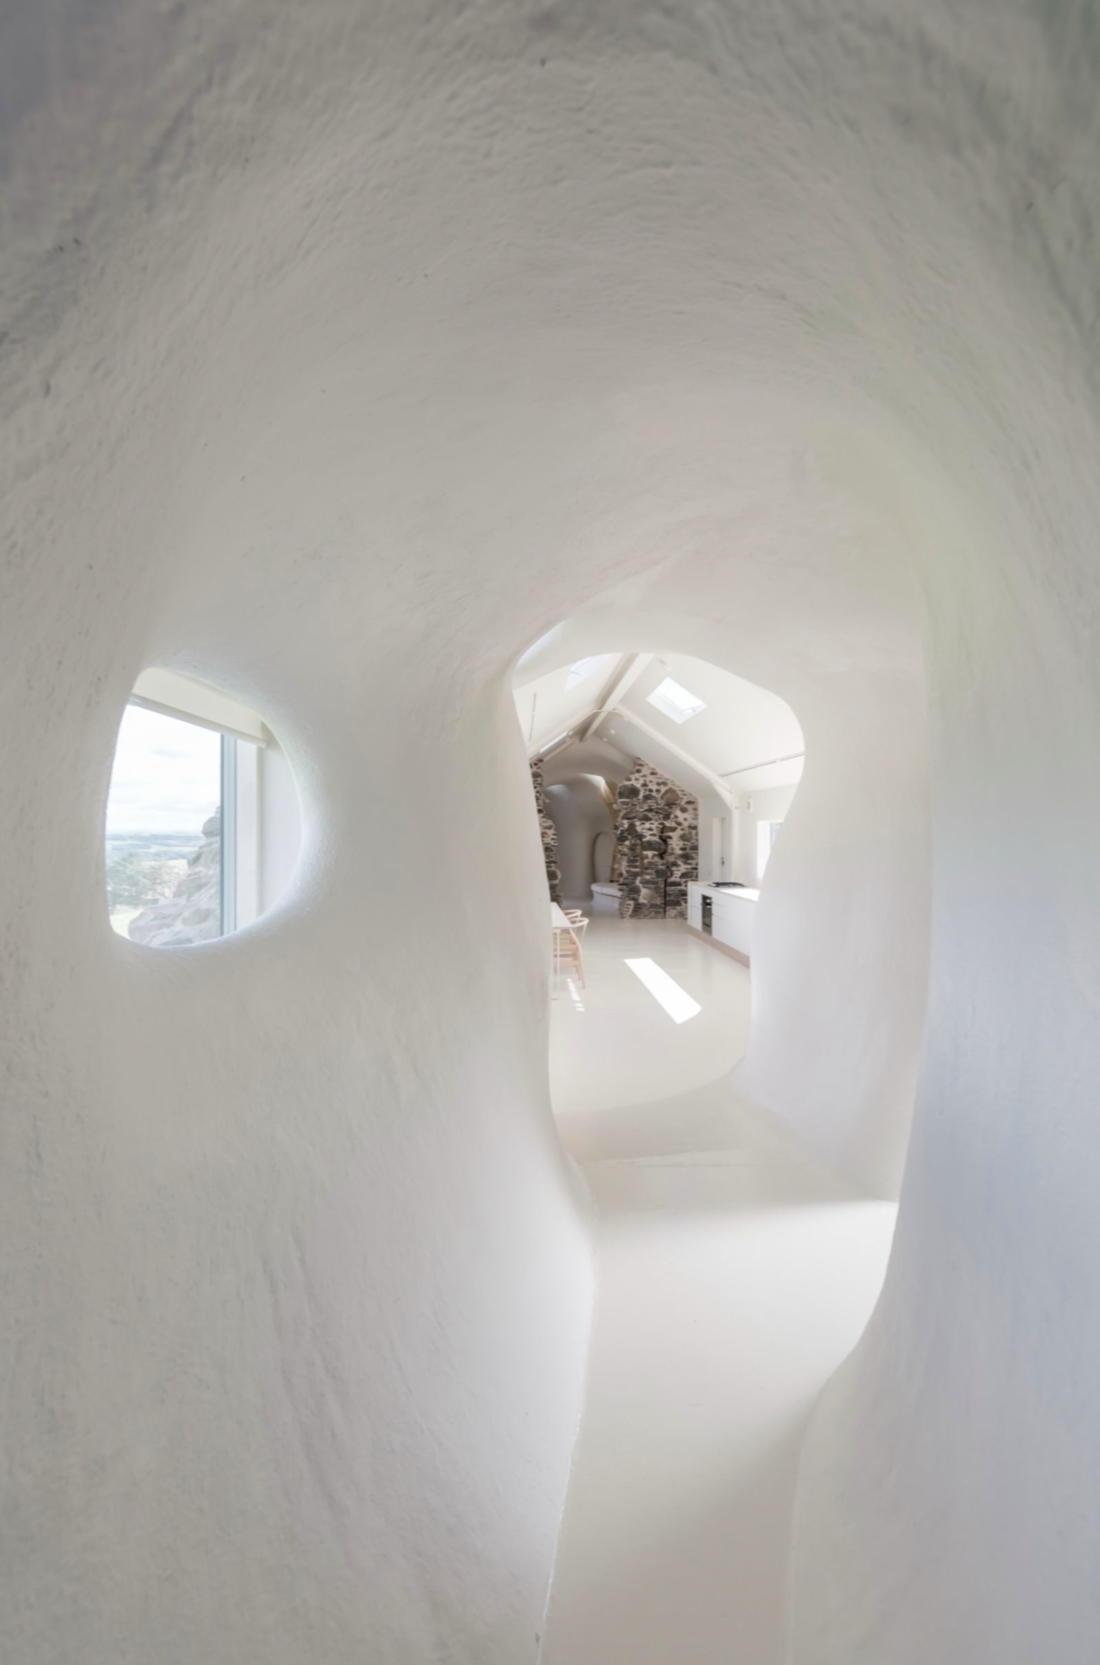 Совместный проект студий Lily Jencks и Nathanael Dorent Architecture 45